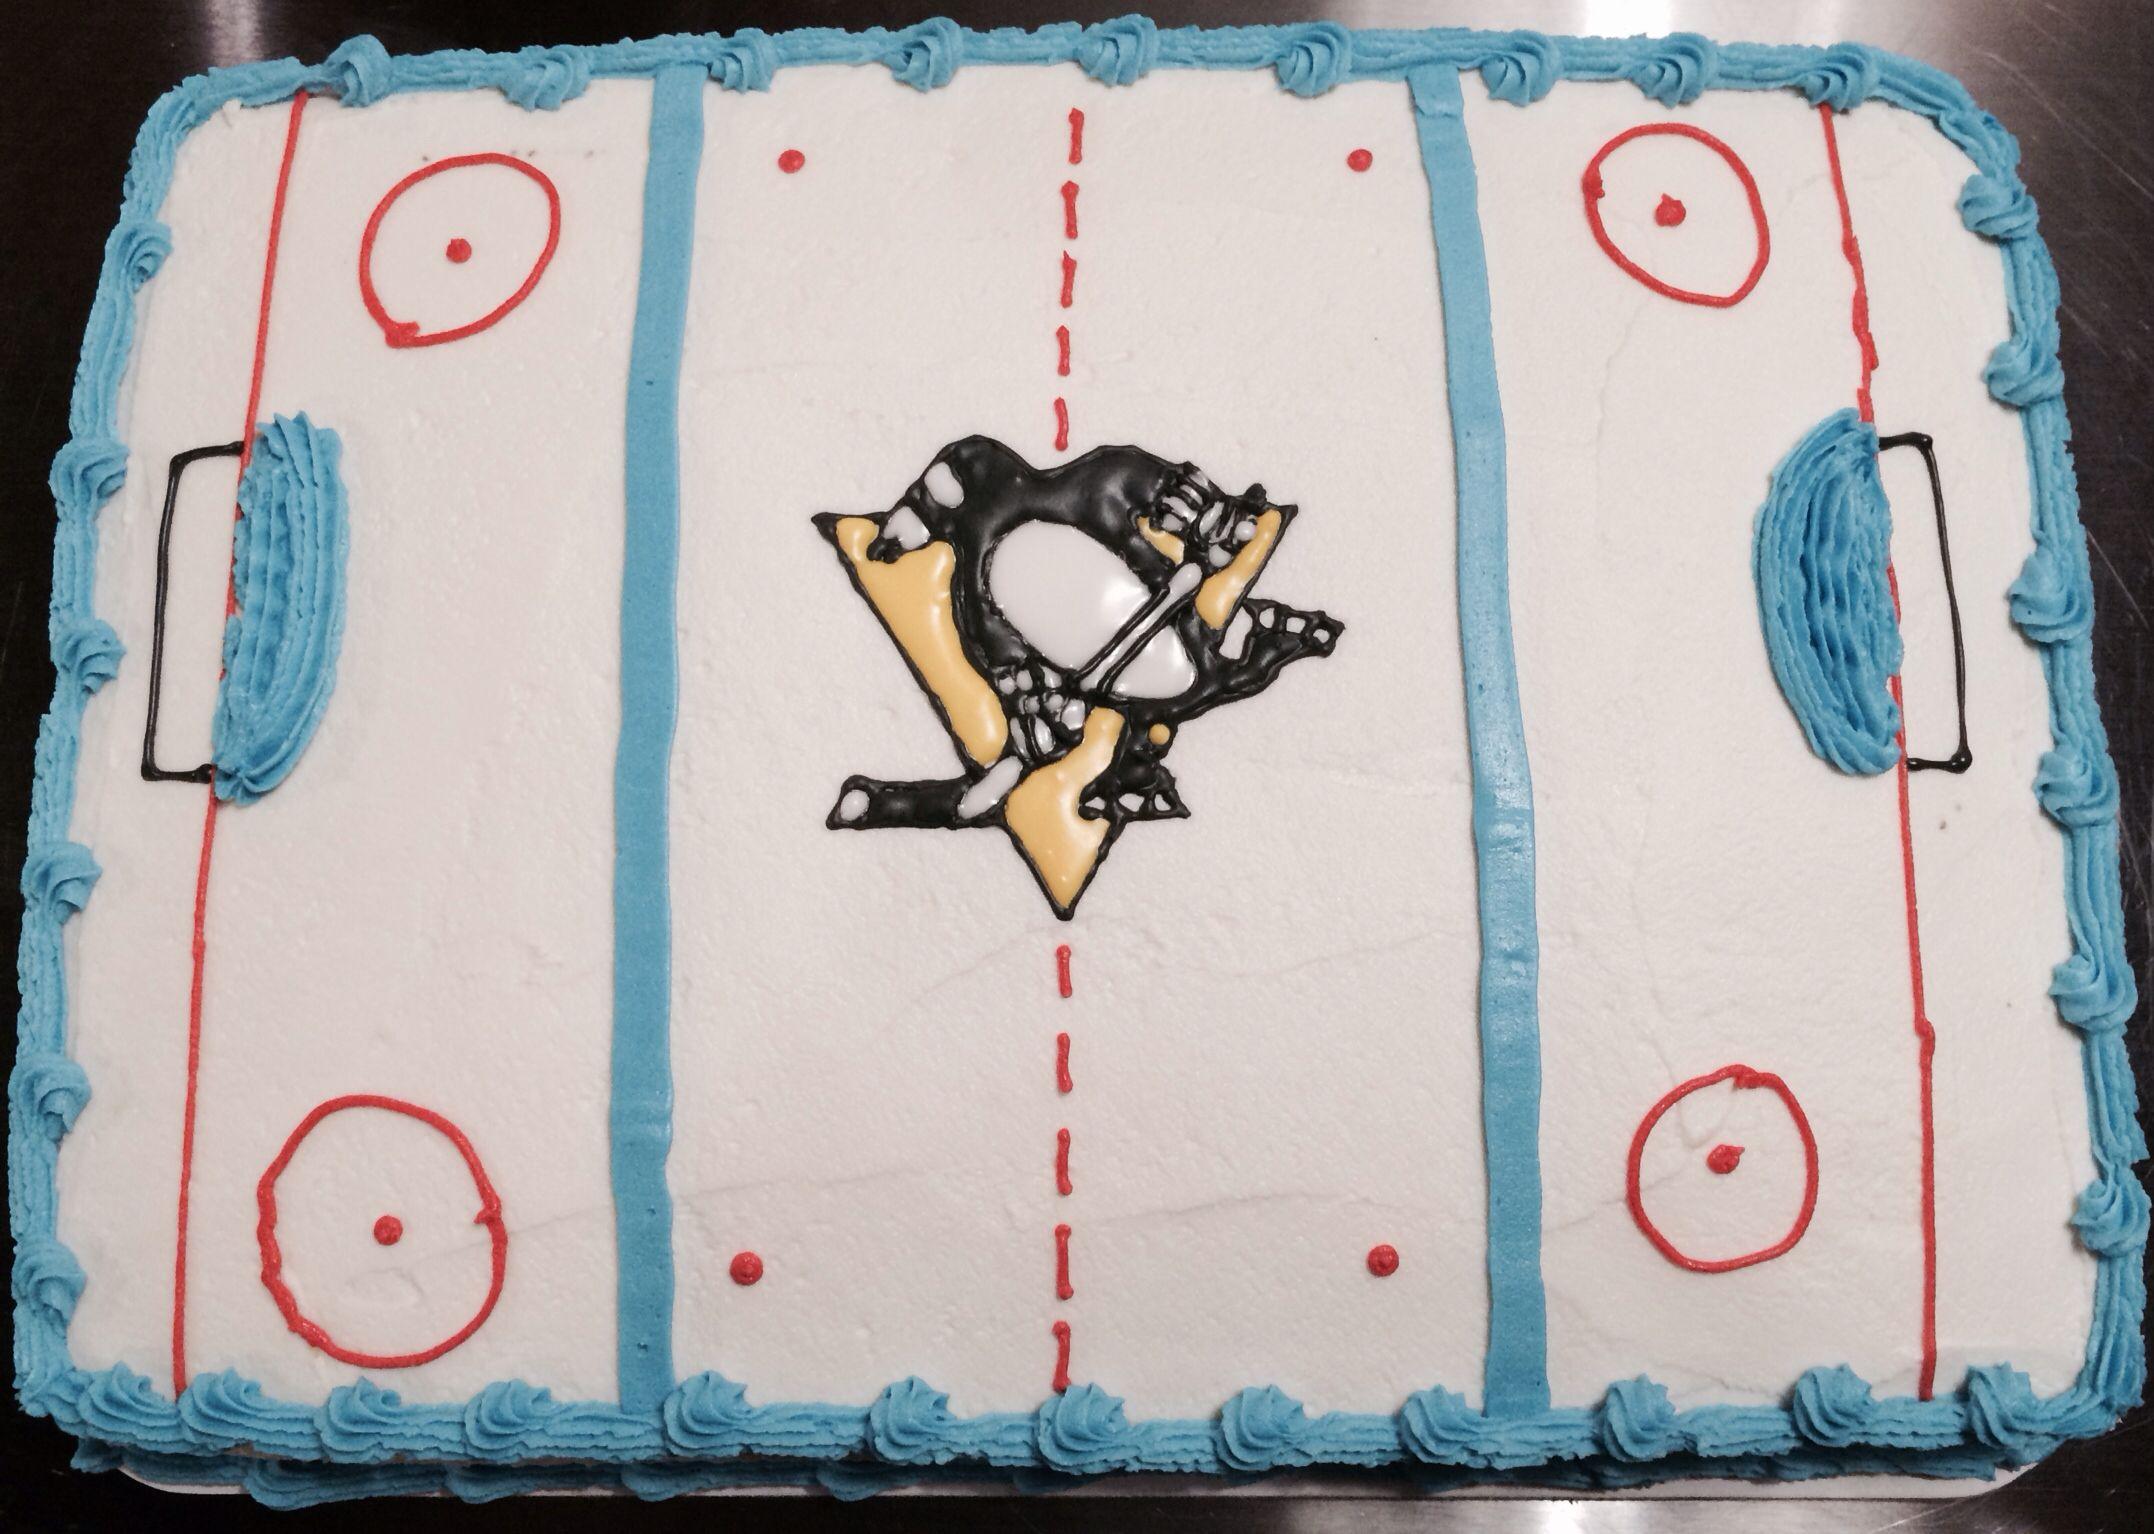 Pittsburgh Penguins Bedroom Decor Pittsburgh Penguins Cake Pittsburgh Penguins Logo Cake